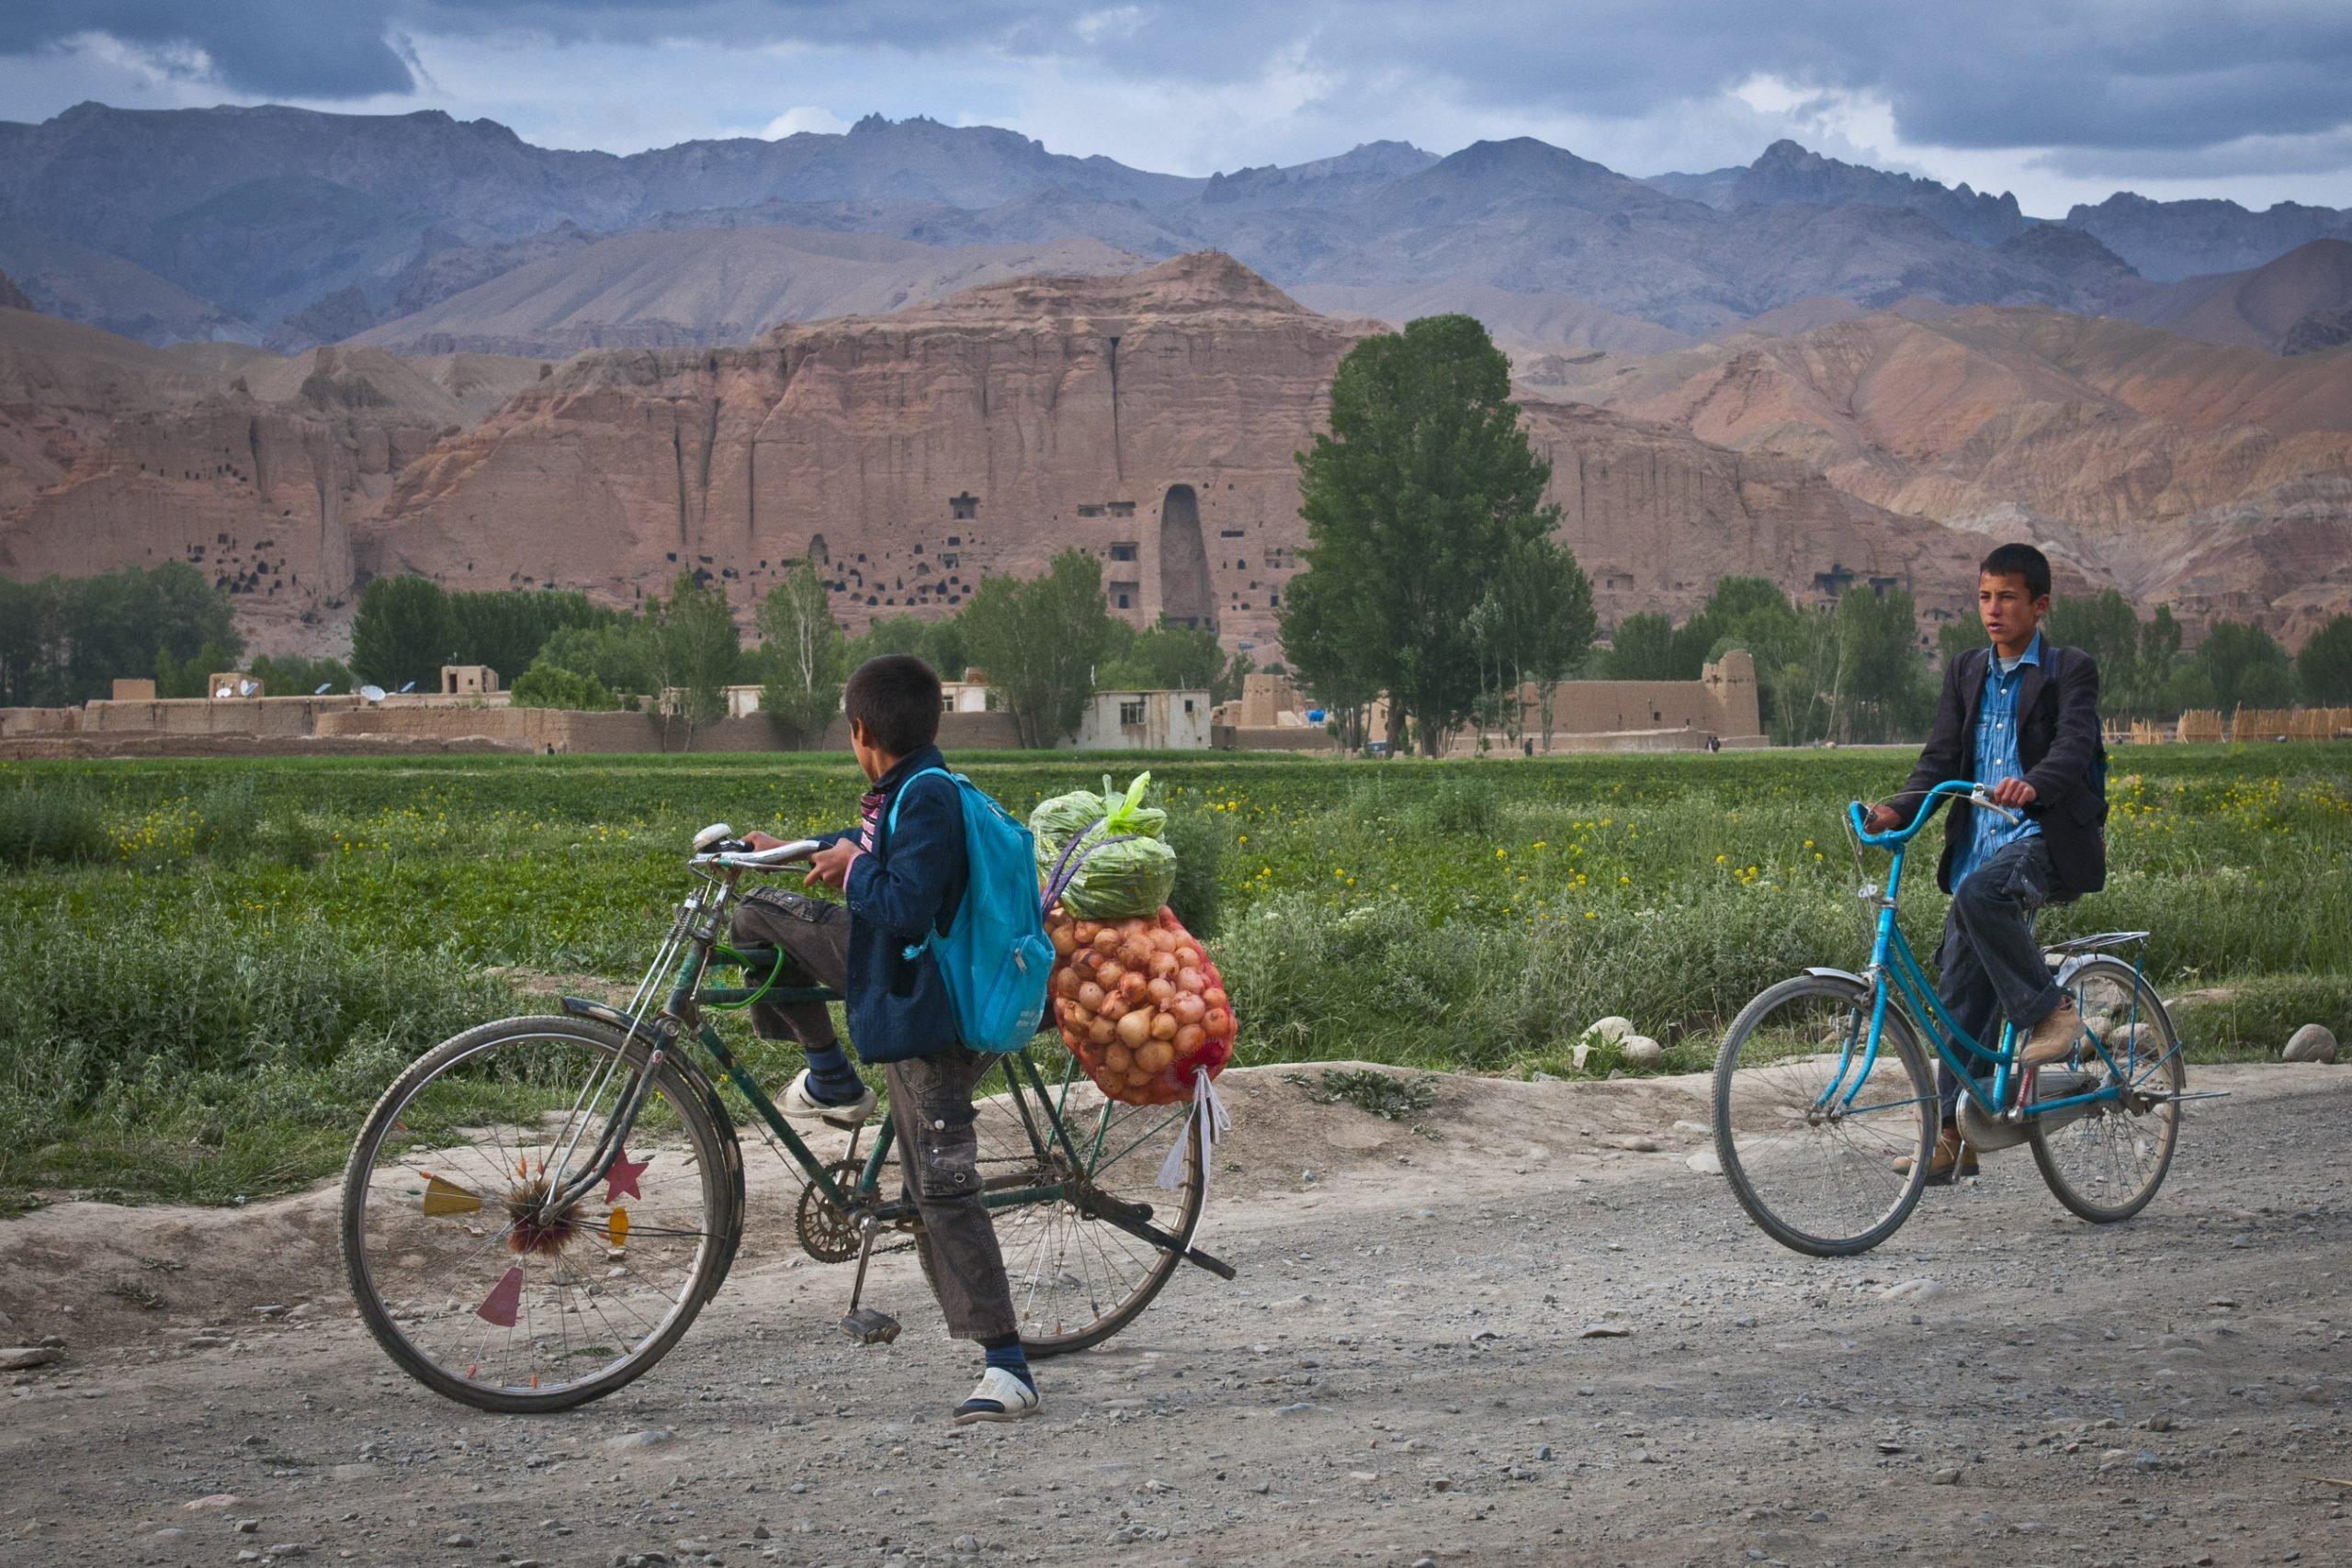 Giant standing Buddhas of Bamyan still cast shadows